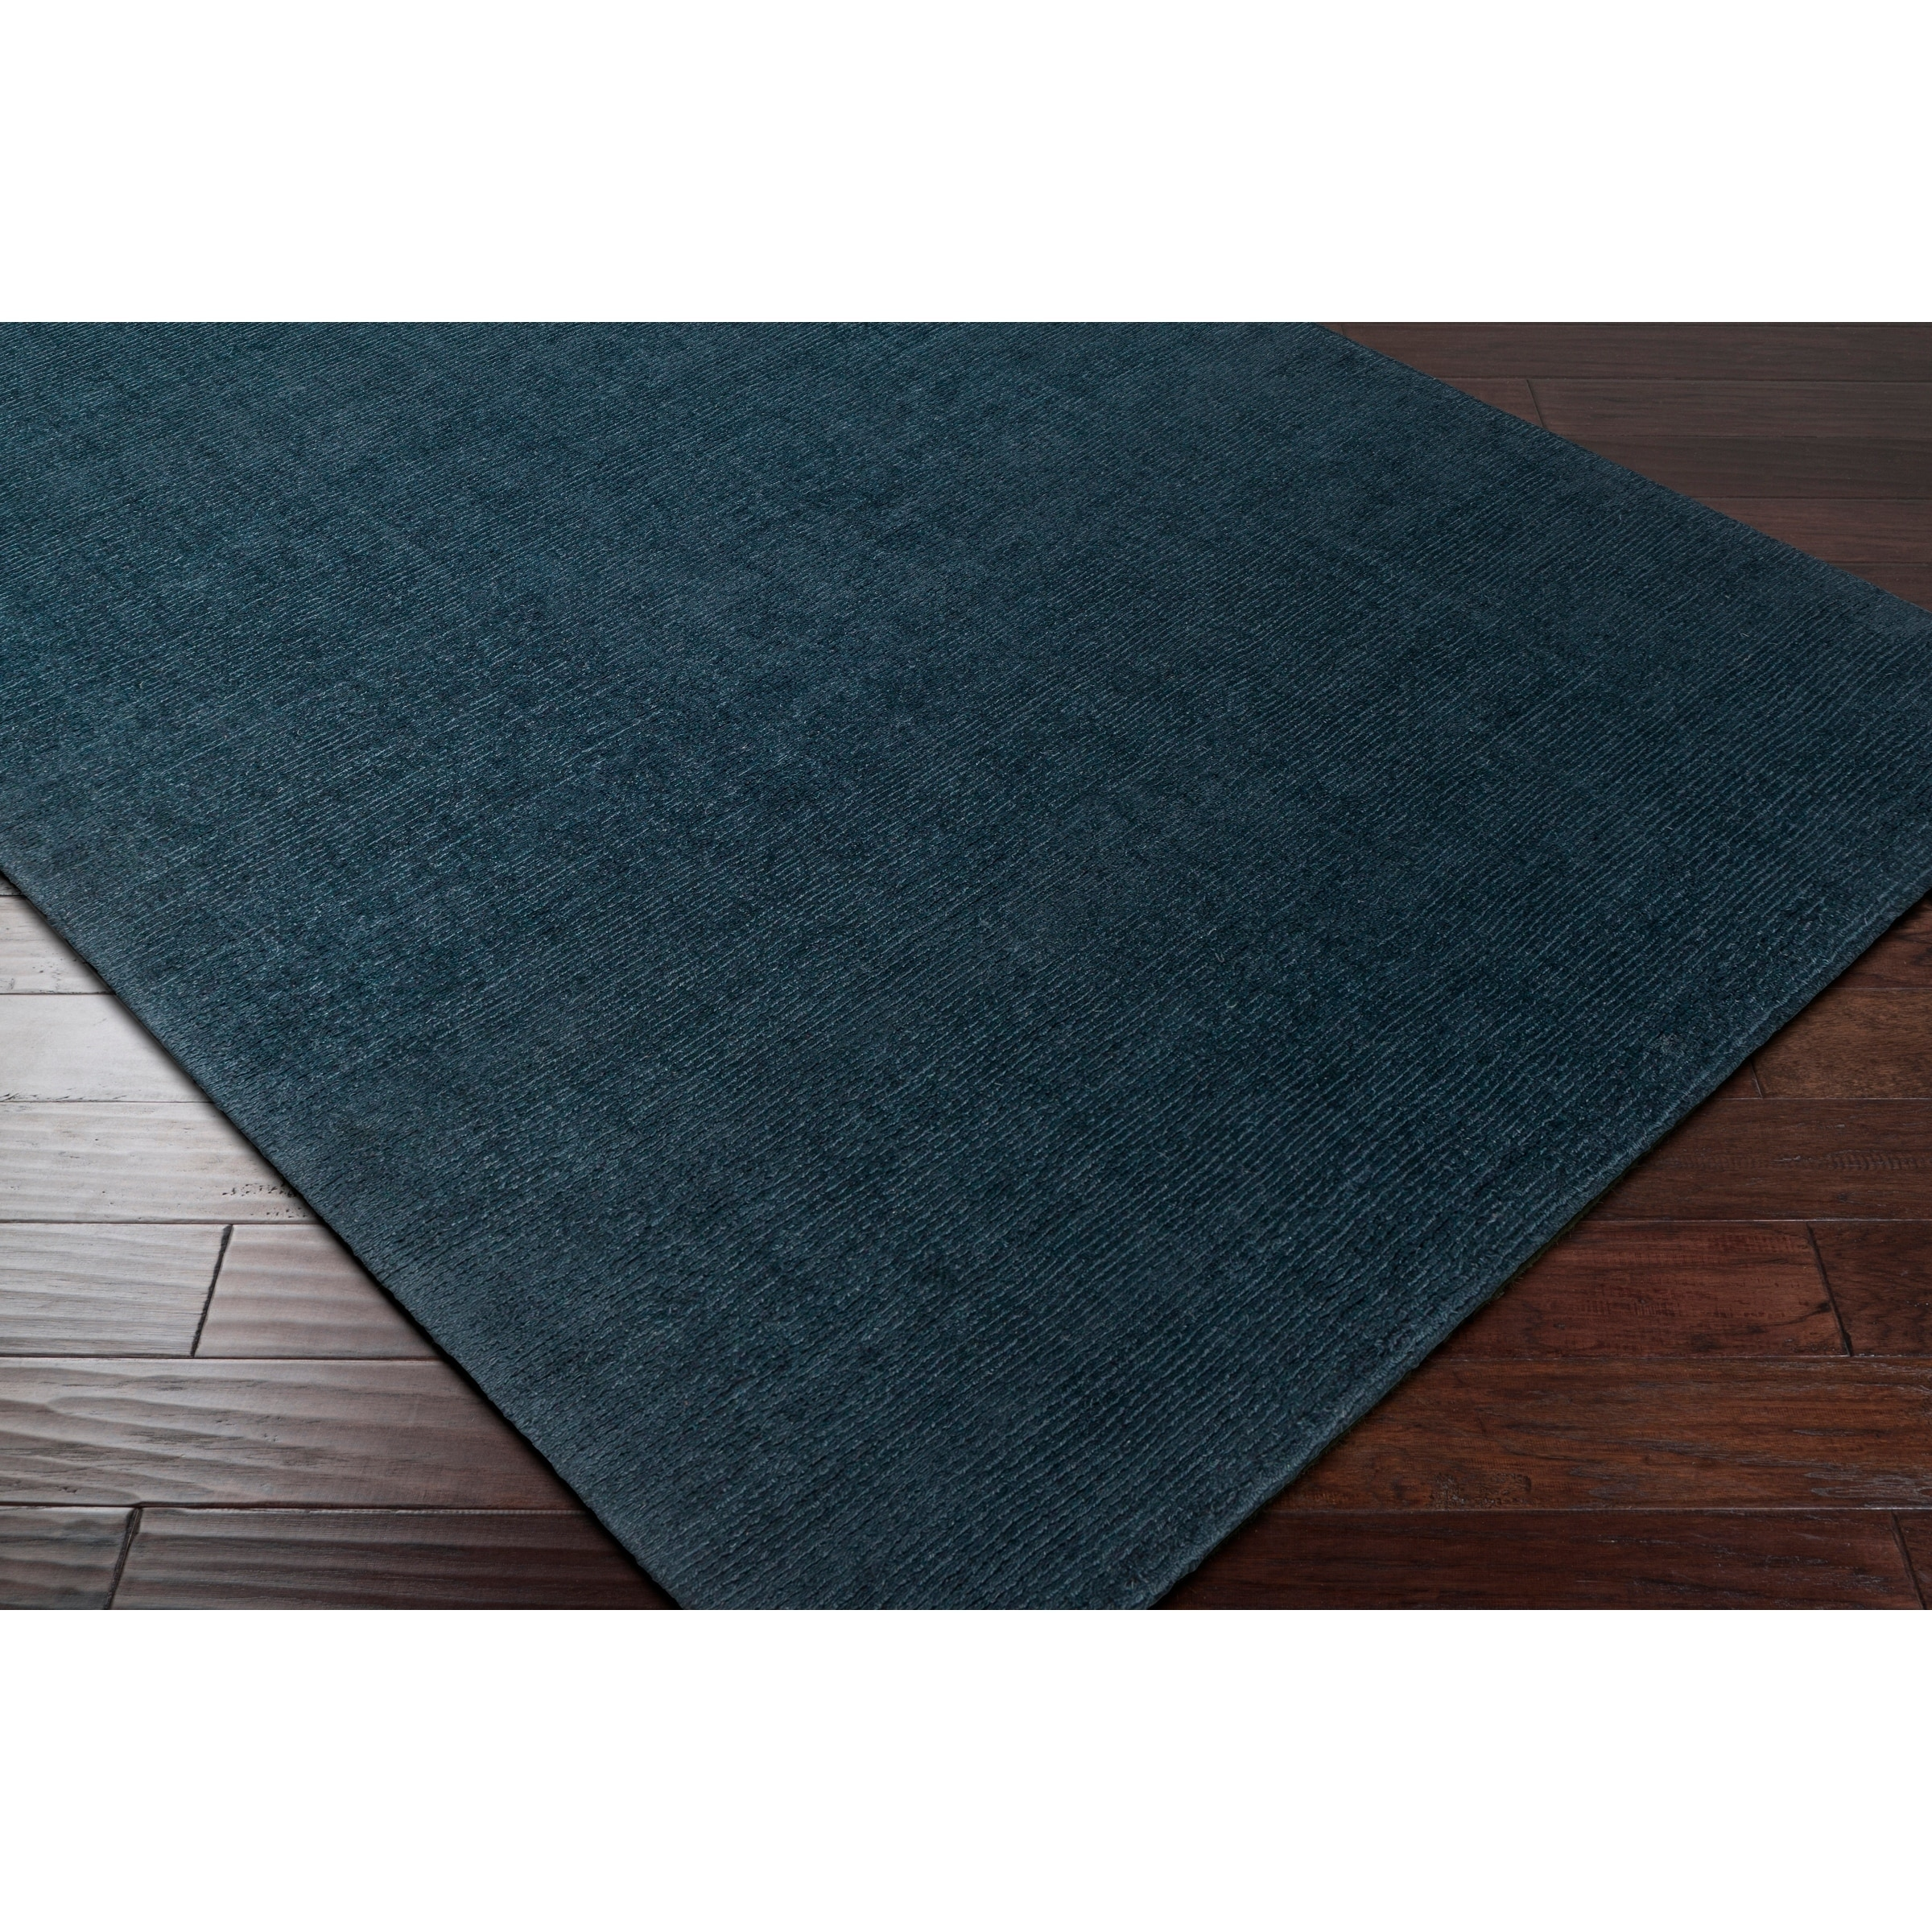 Solid Causal Dox O Wool Area Rug 6